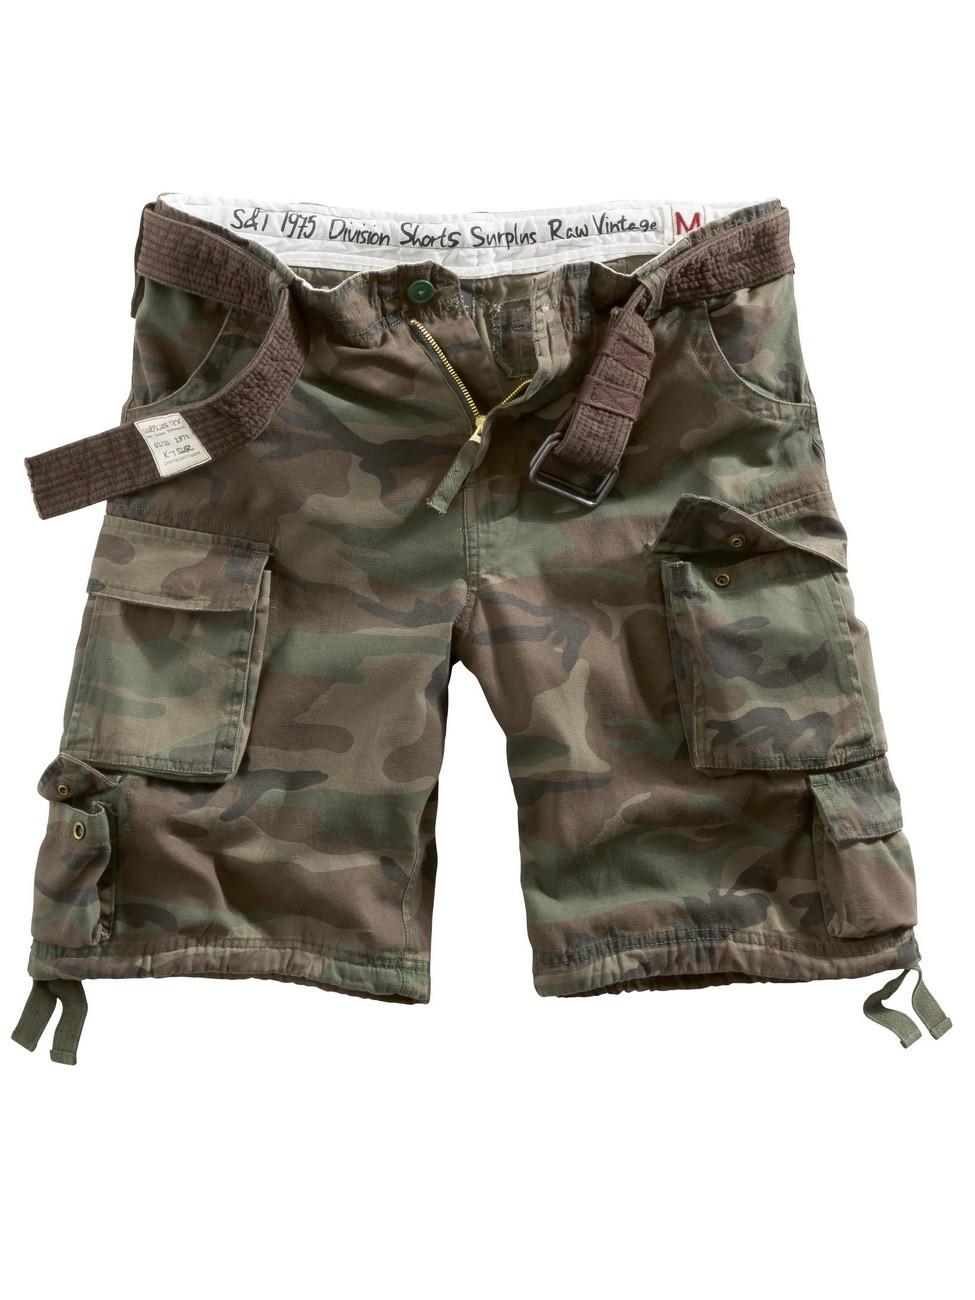 Surplus Herren Shorts Division Shorts 07-5598